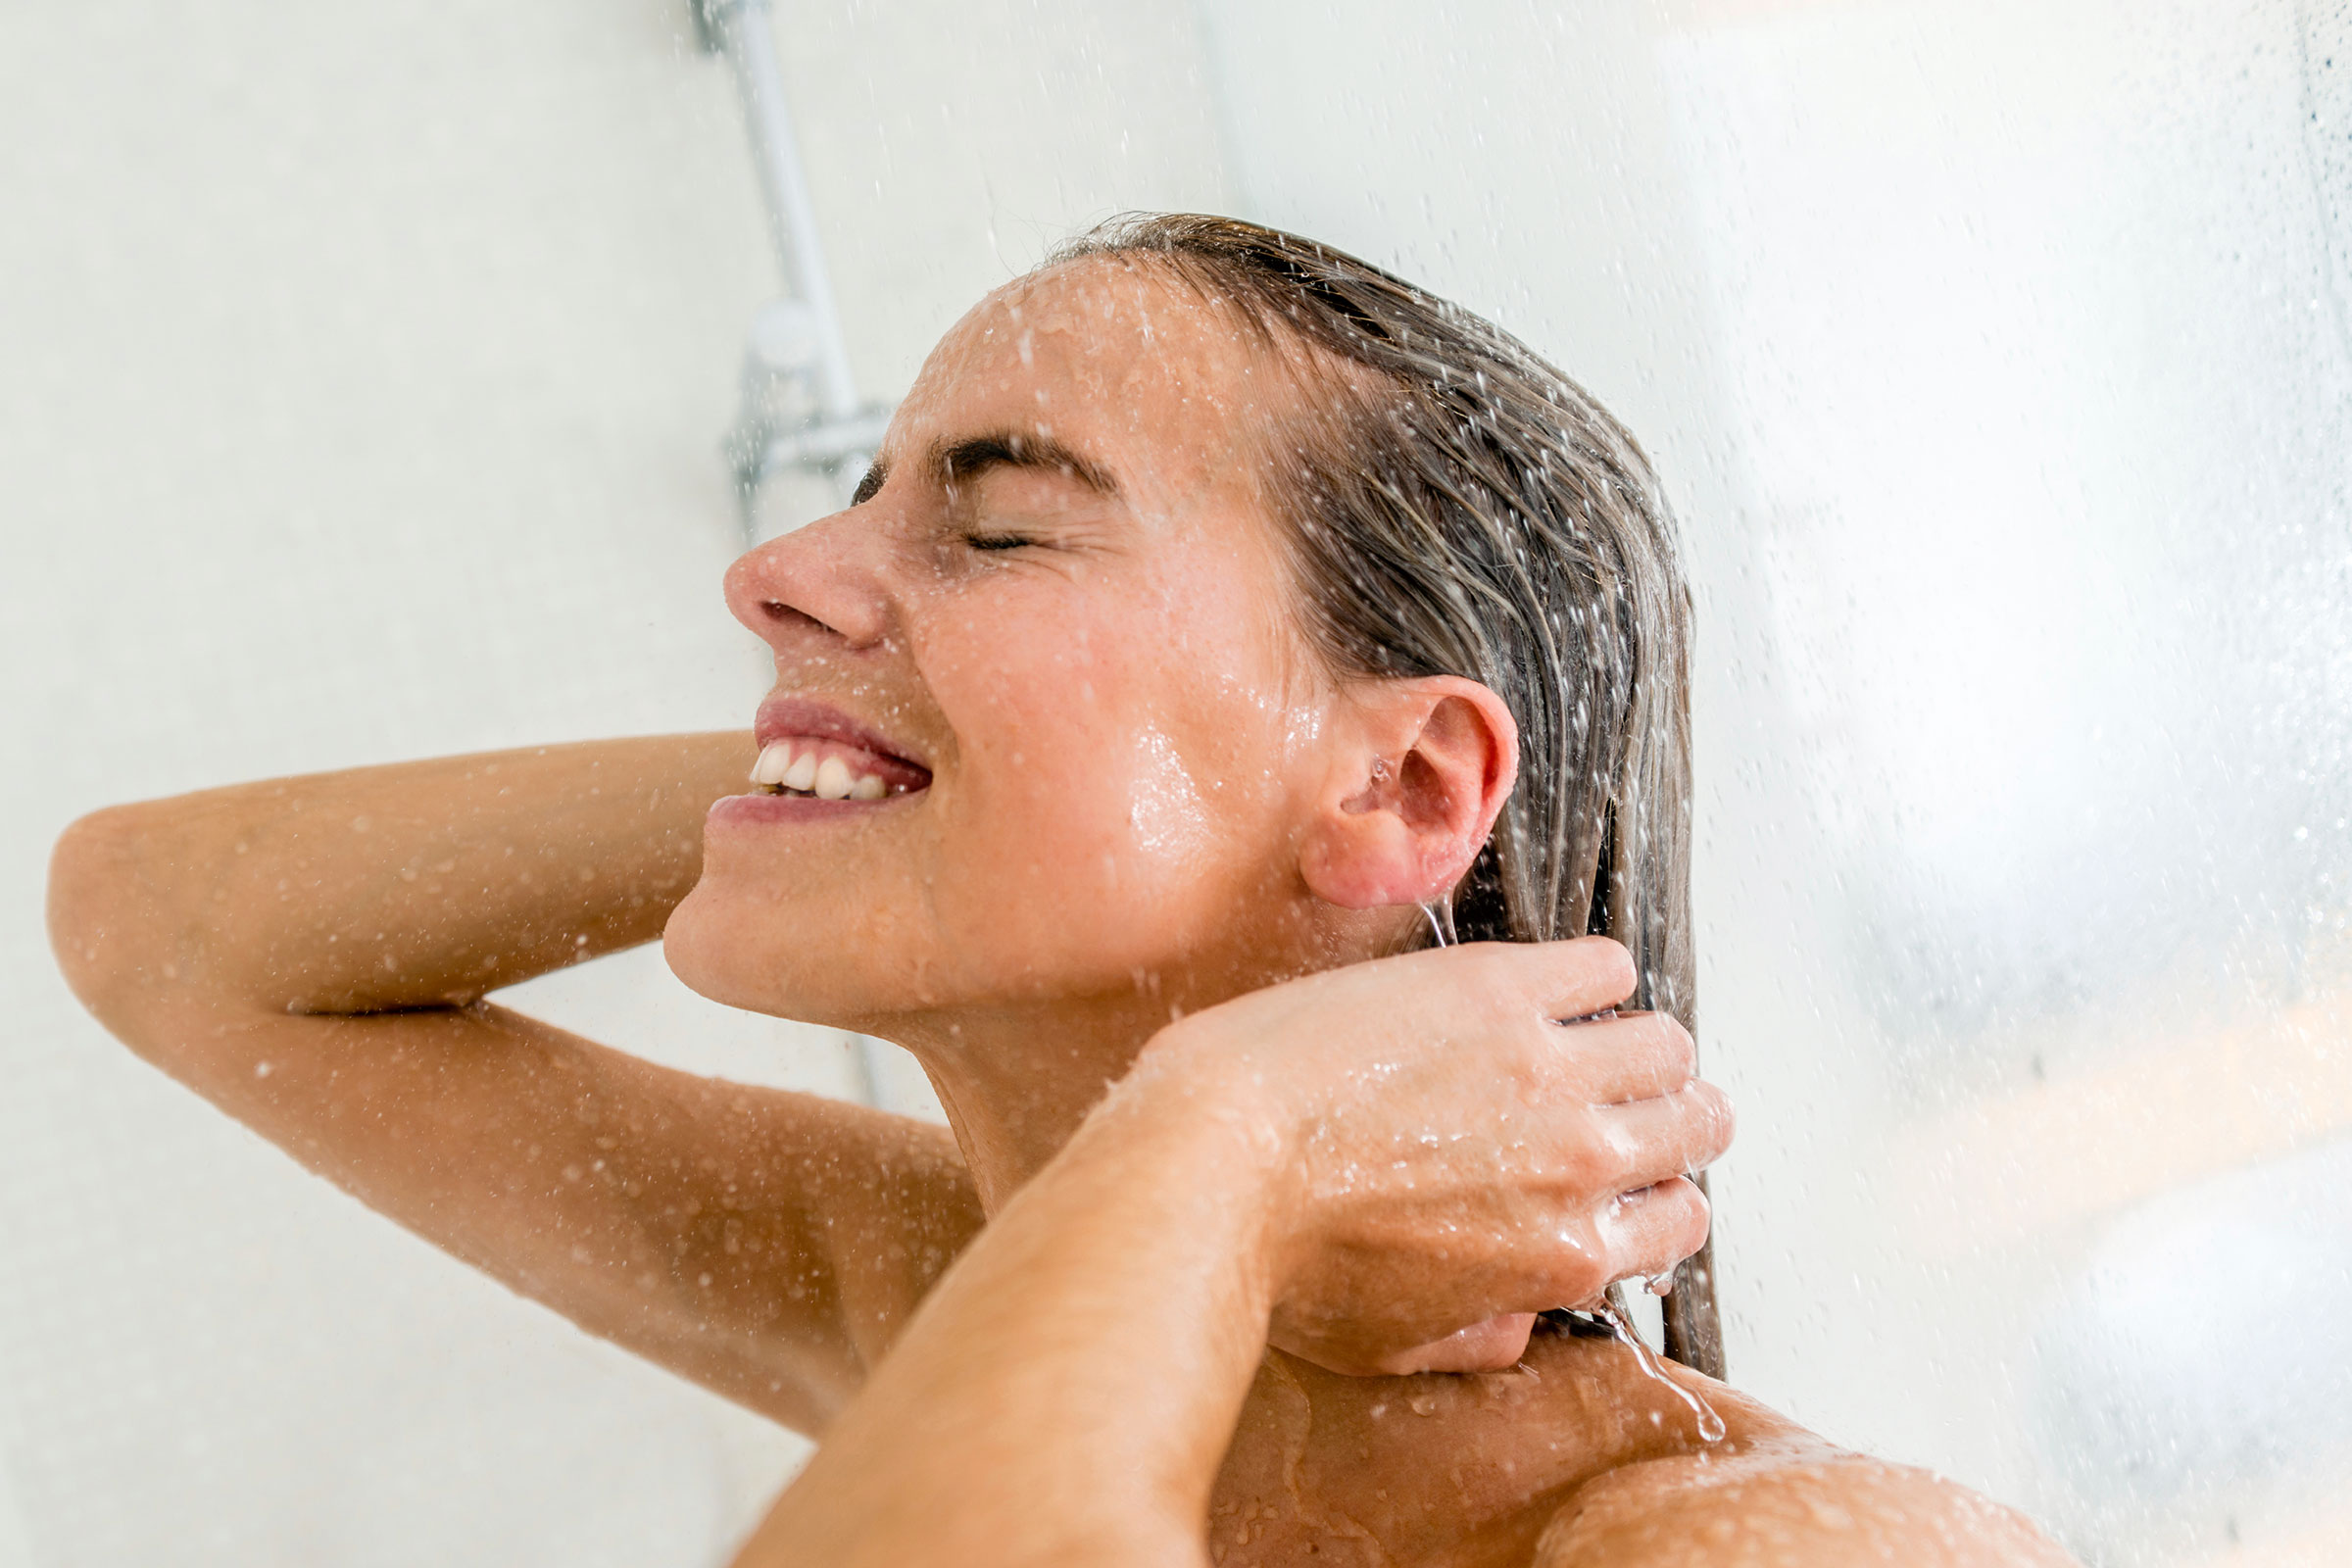 теплый душ после массажа